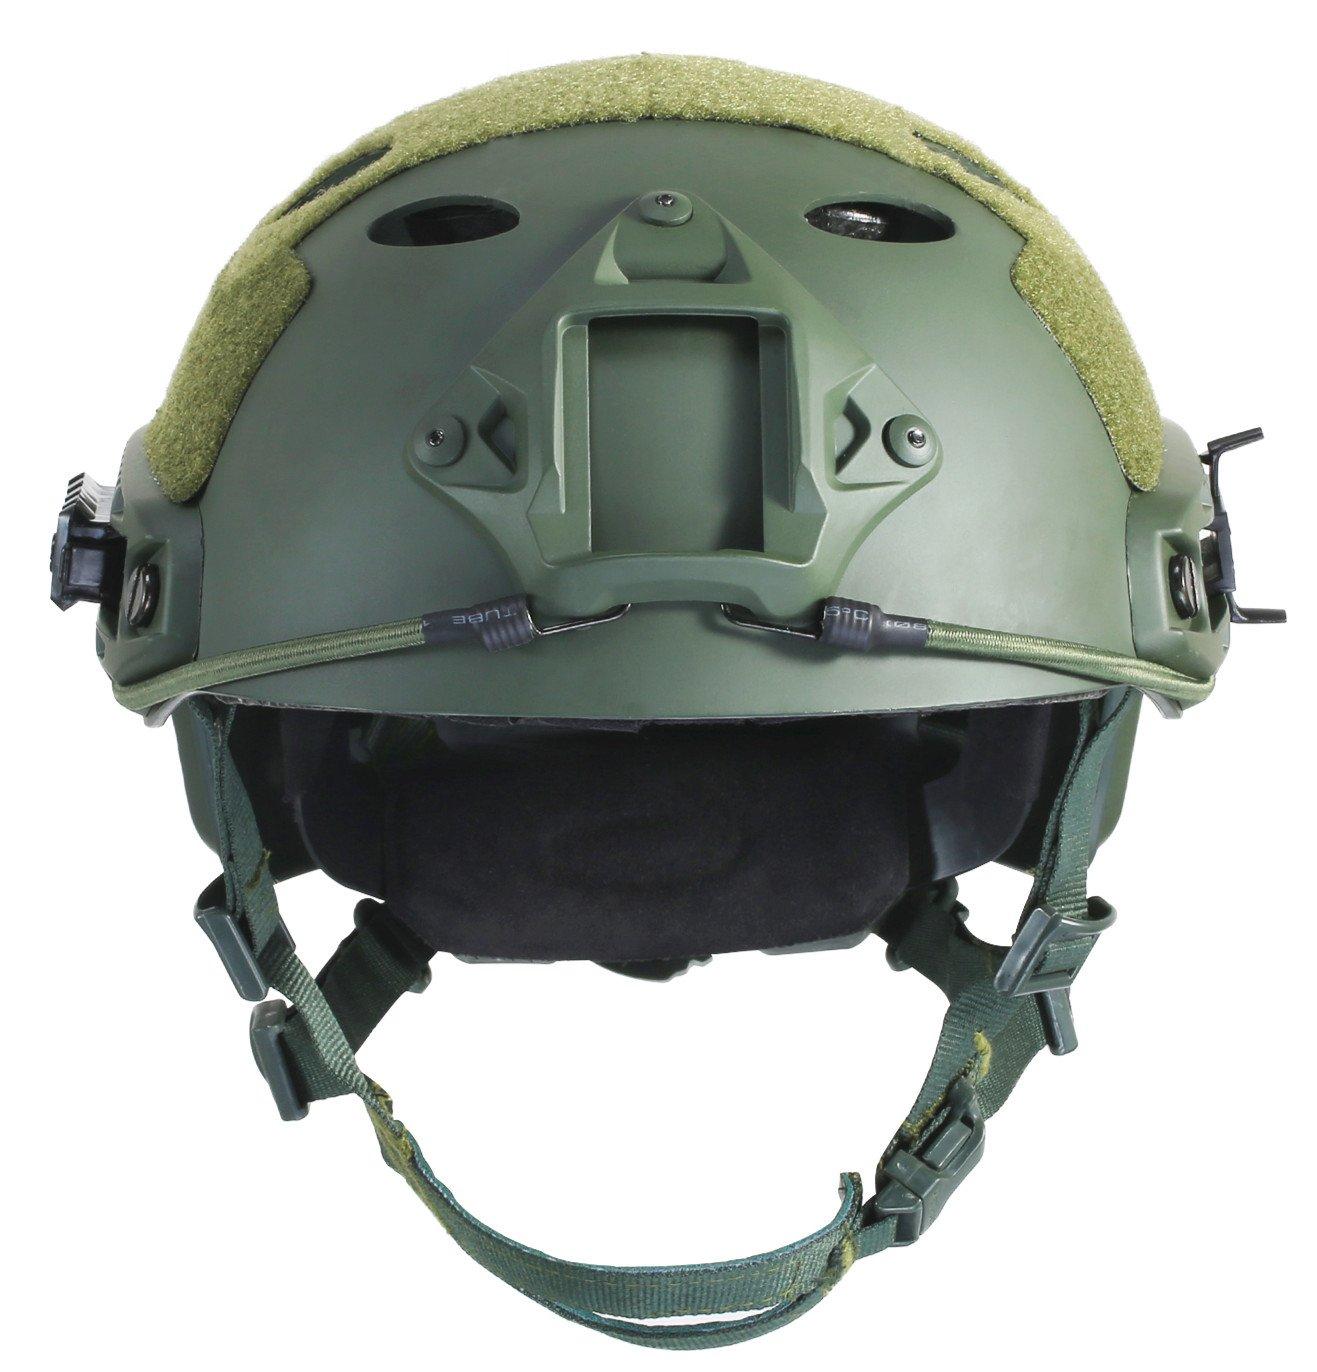 OneTigris PJ moderno casco táctico ligero para airsoft paintball, color Armee Grün, tamaño Kopfumfang: 56cm -60cm (22 - 23,6) 6)